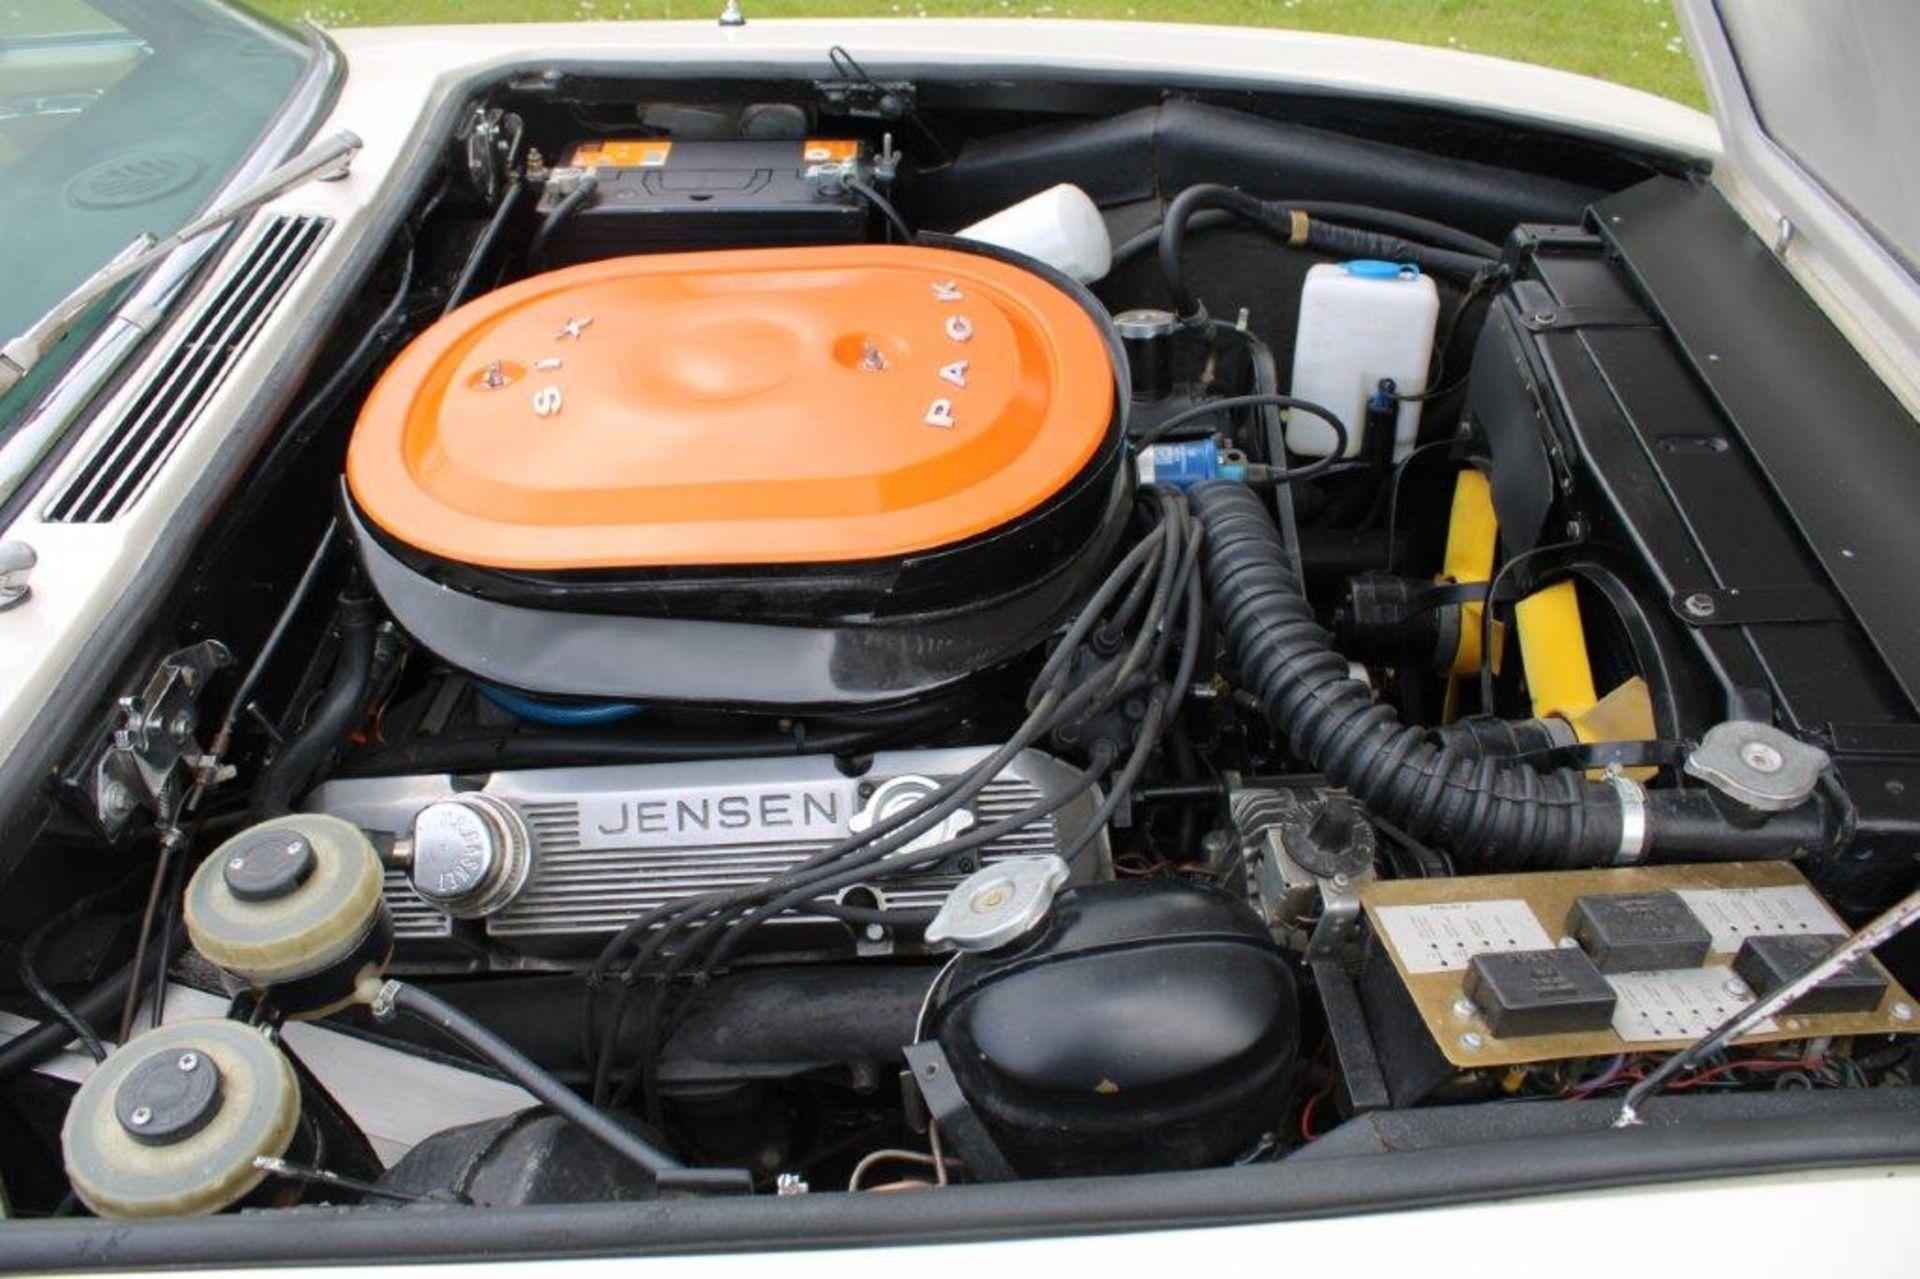 1972 Jensen Interceptor SP Auto - Image 22 of 32